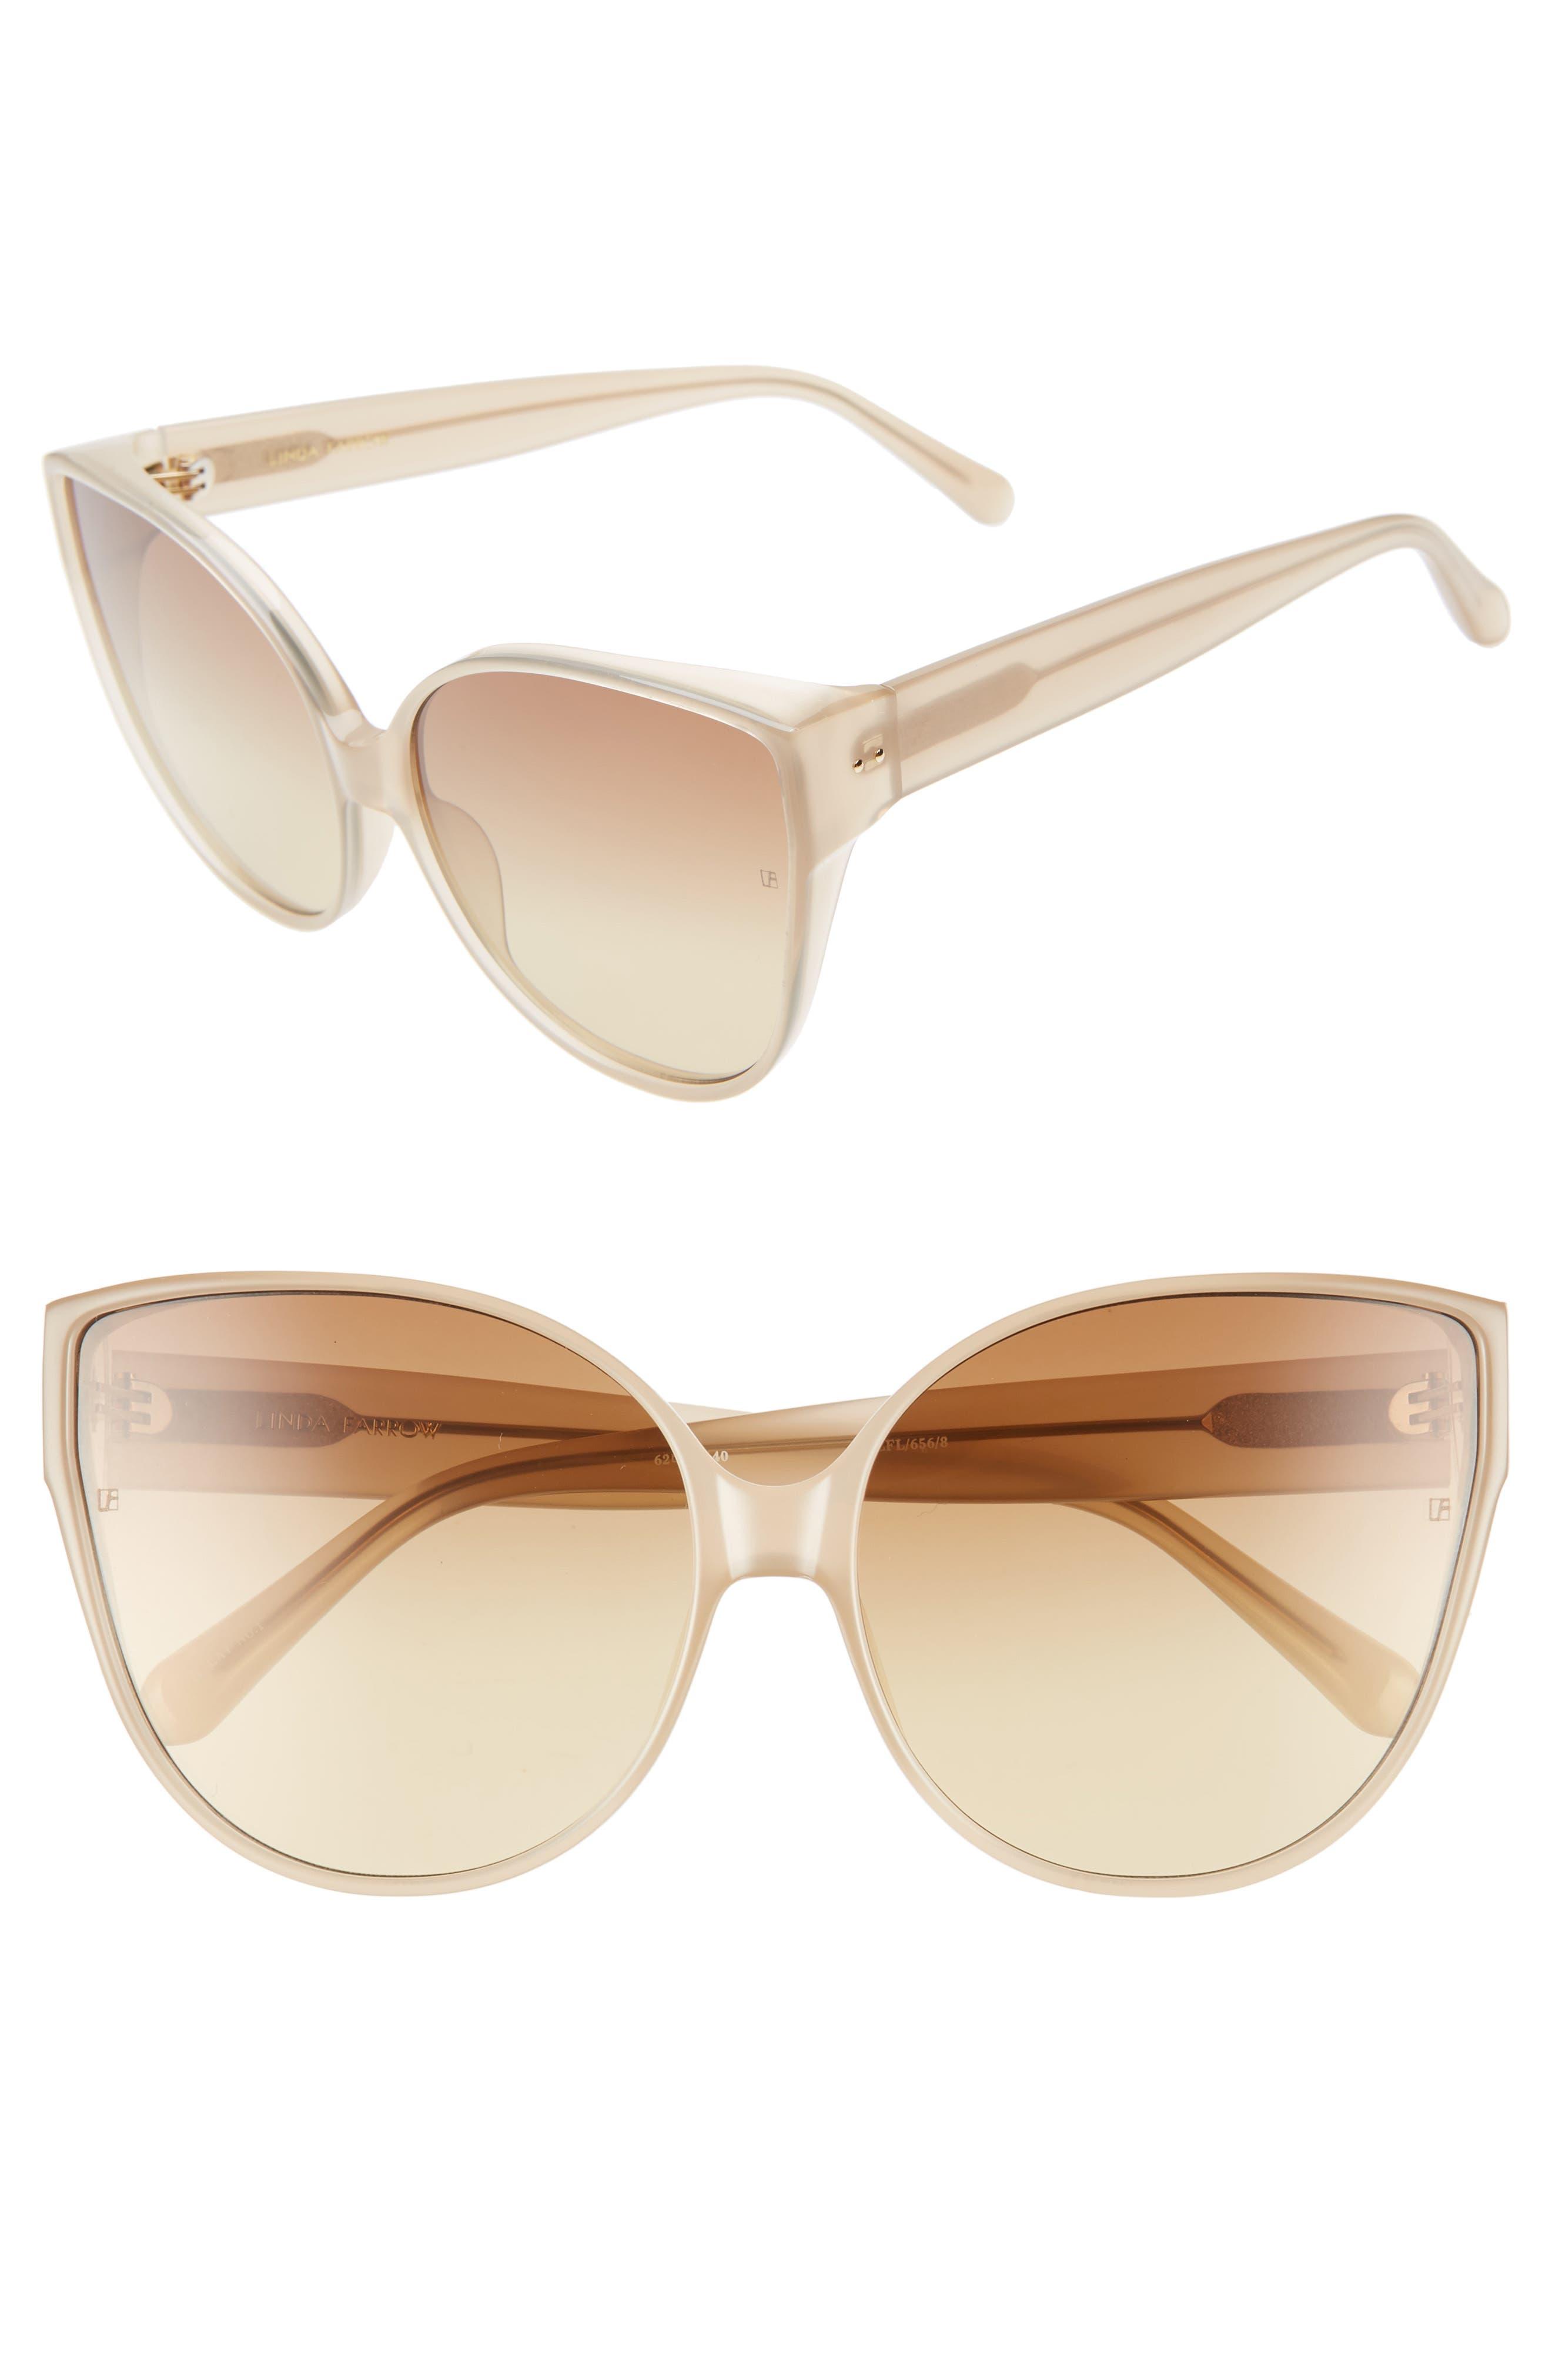 62mm Oversize Cat Eye Sunglasses,                             Main thumbnail 1, color,                             MILKY TOBACCO